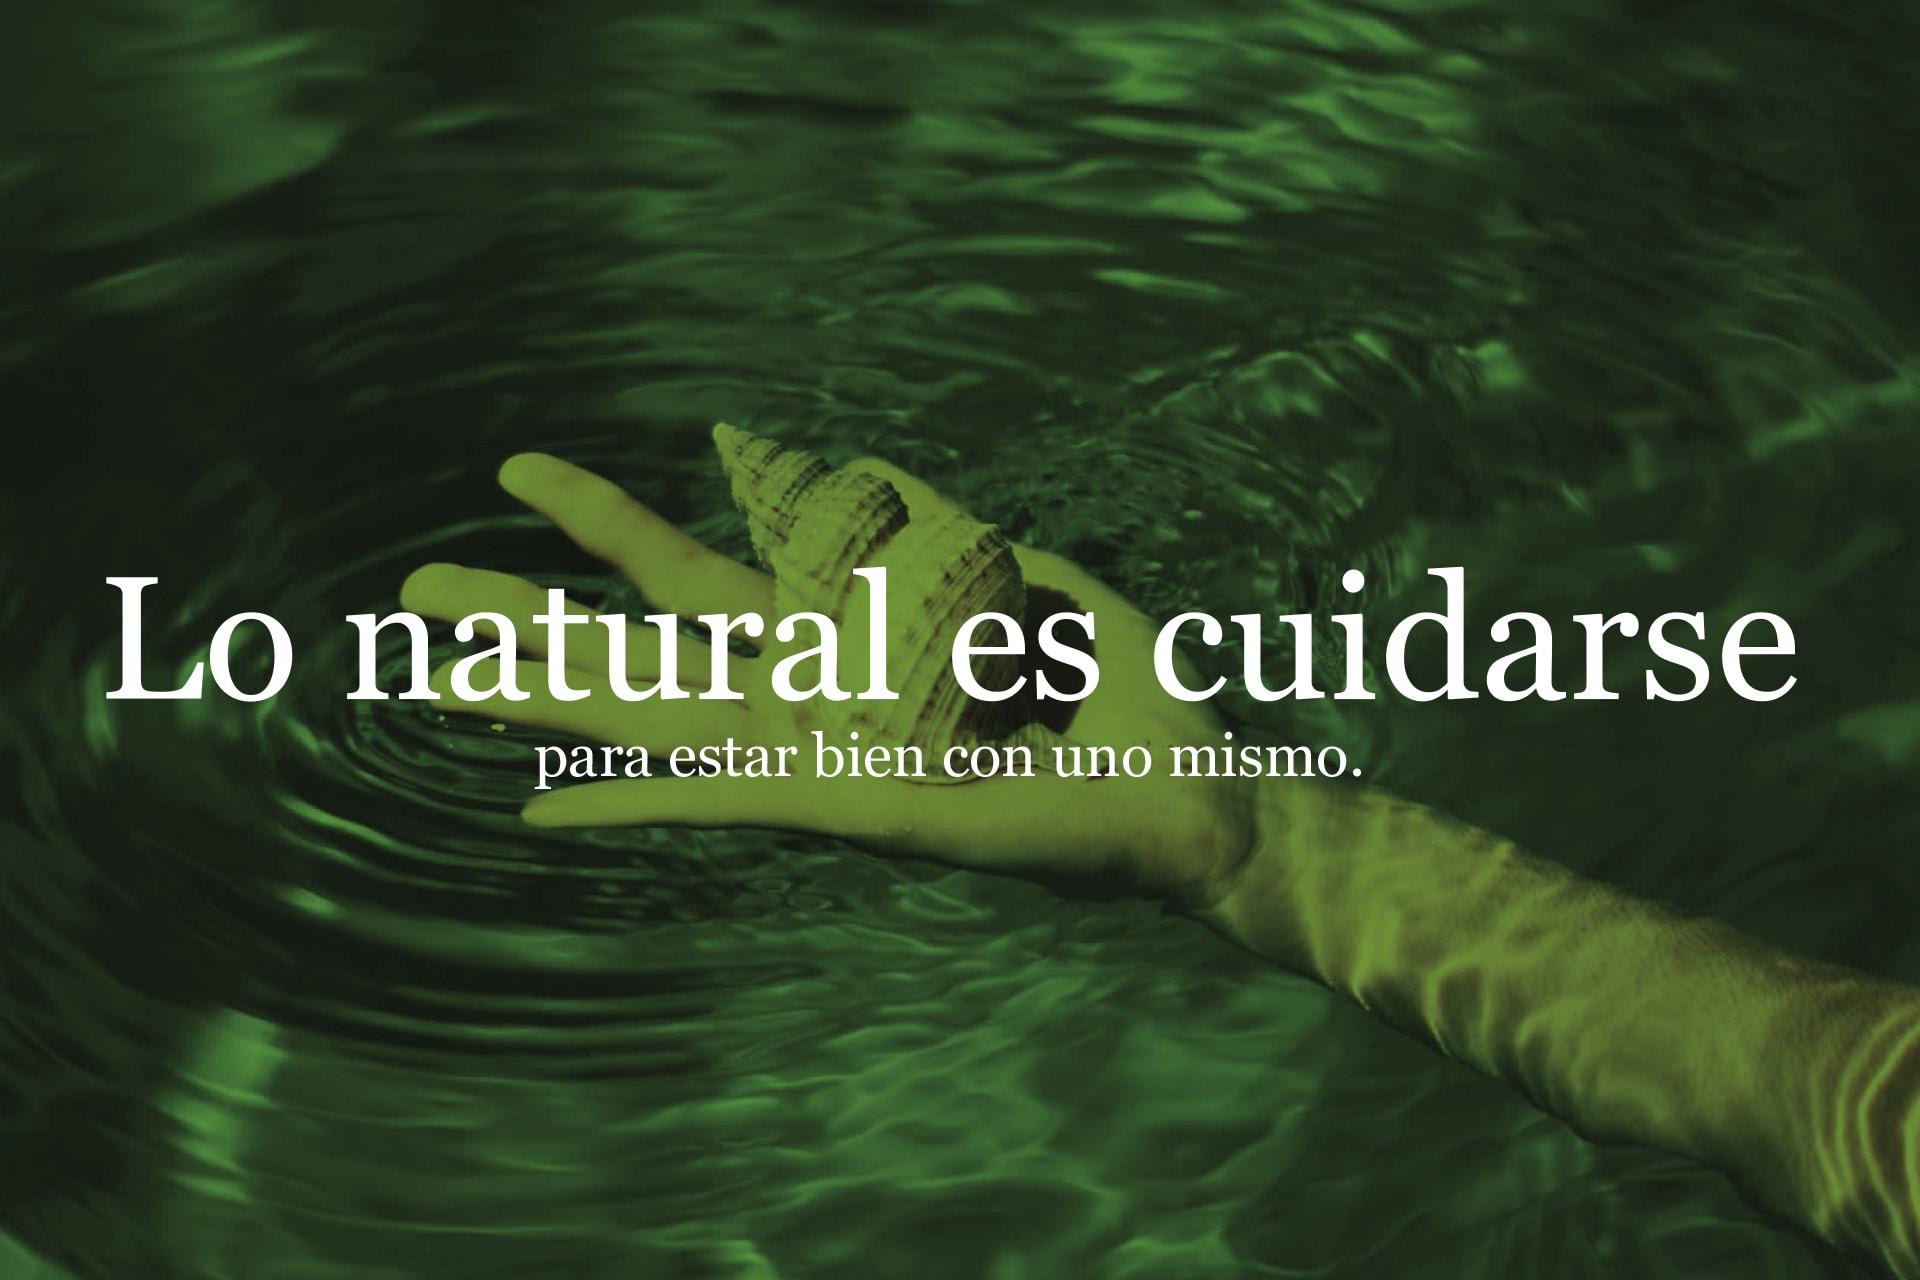 Marca Naturalness